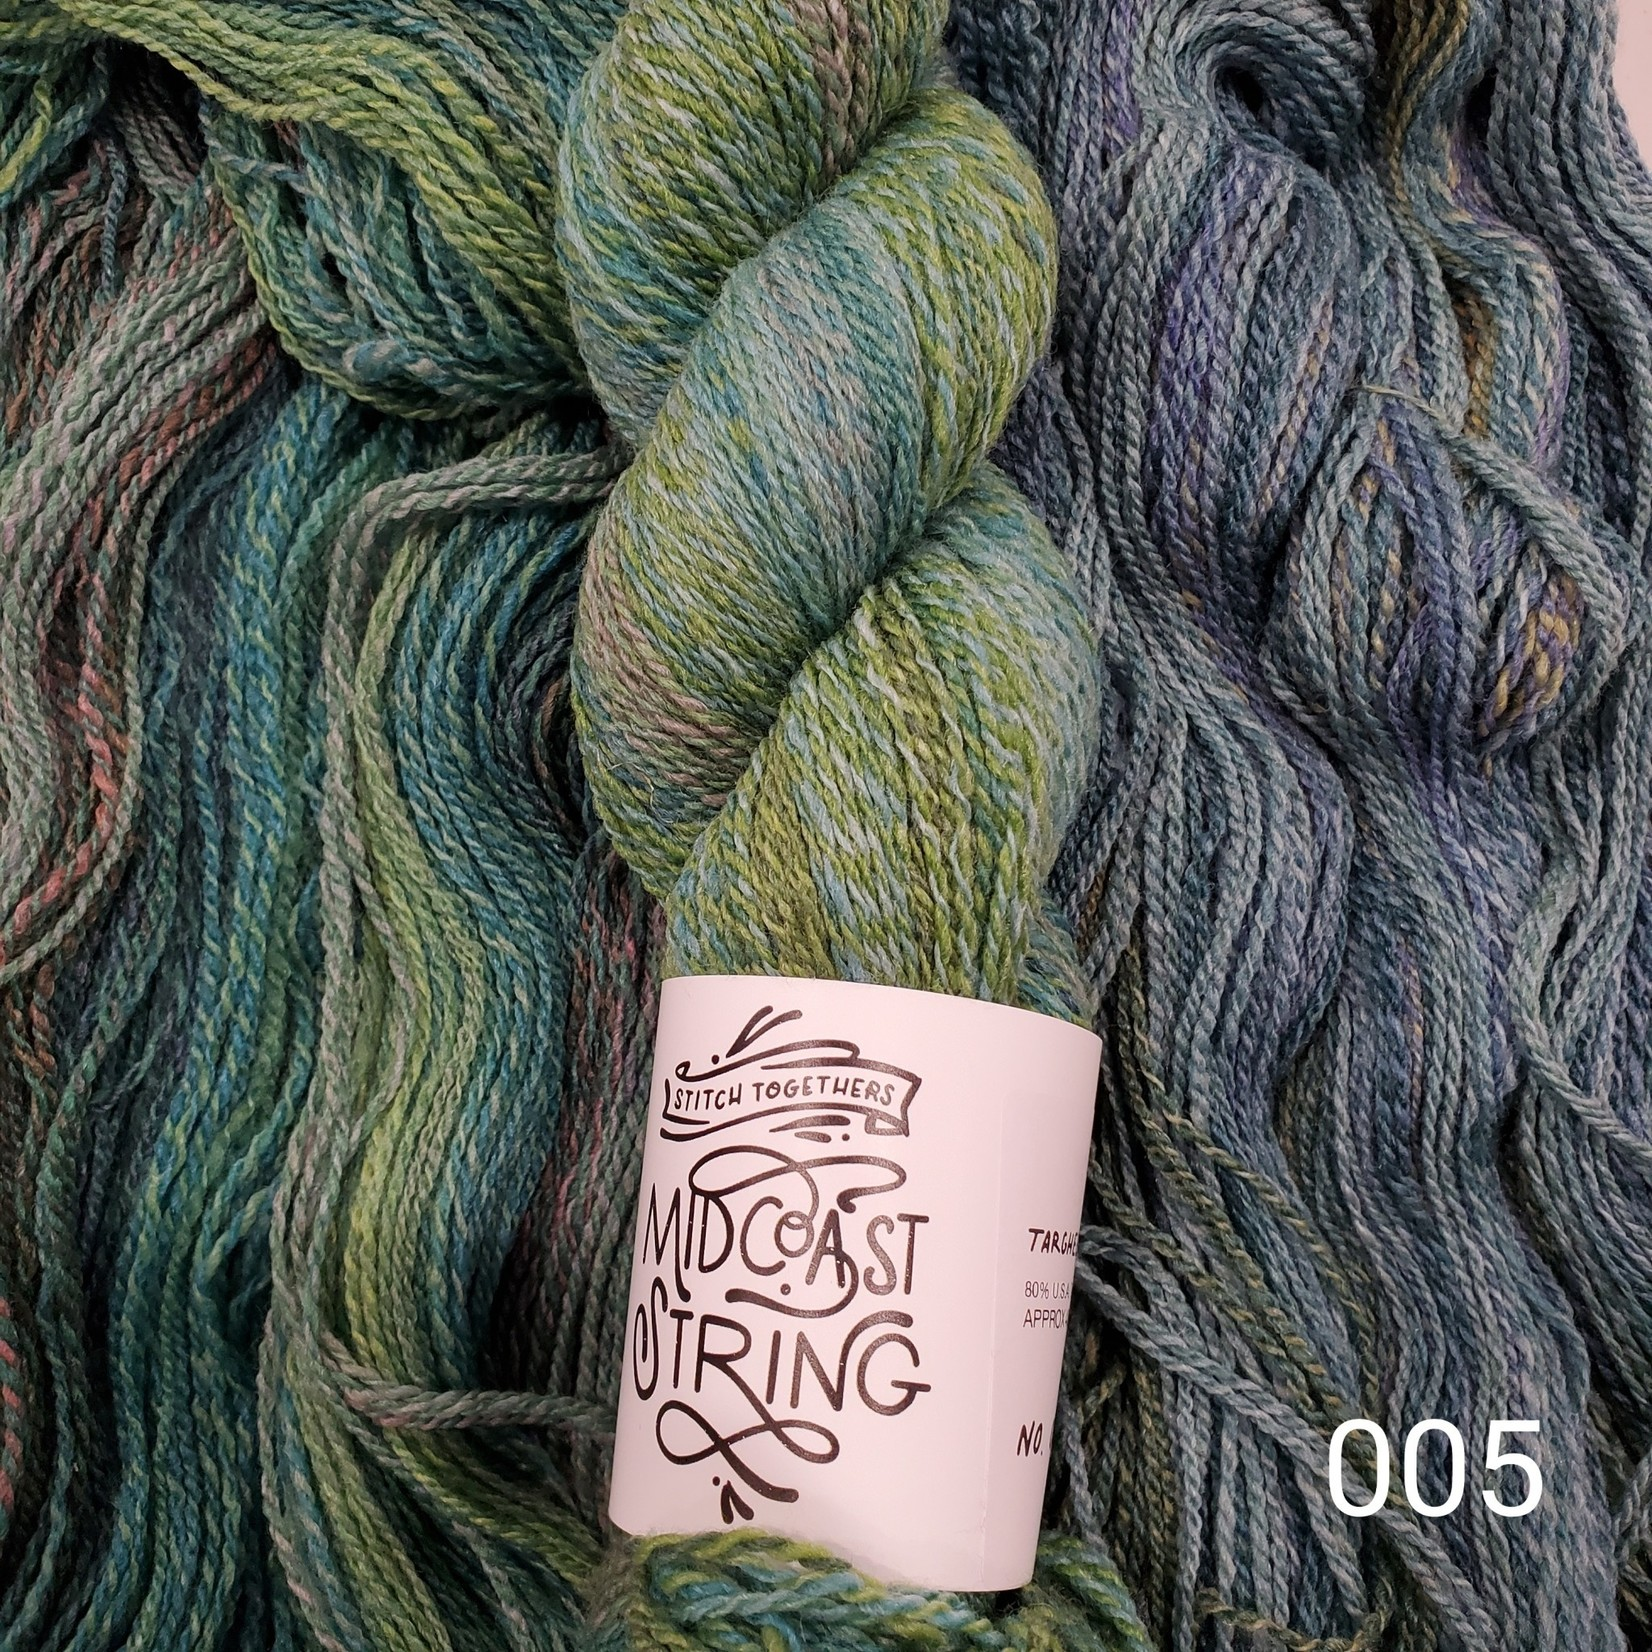 Stitch Together Midcoast String